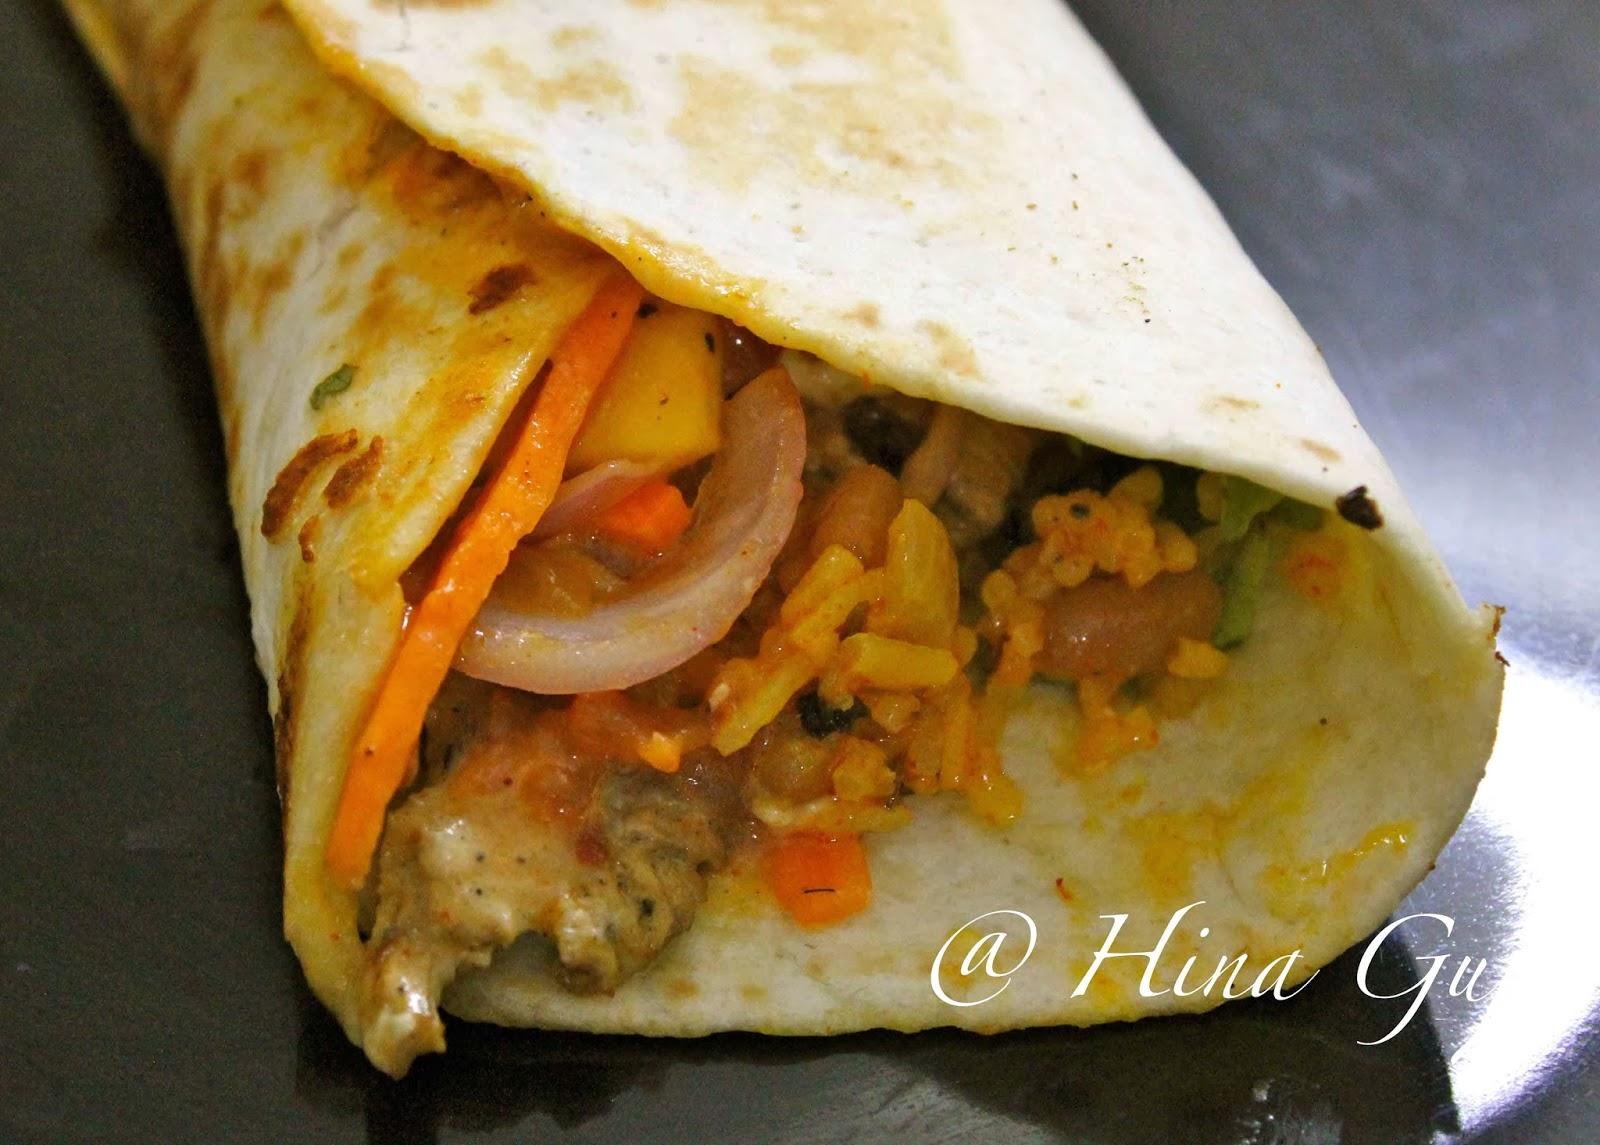 Cajun Rice and Grilled Chicken Burrito